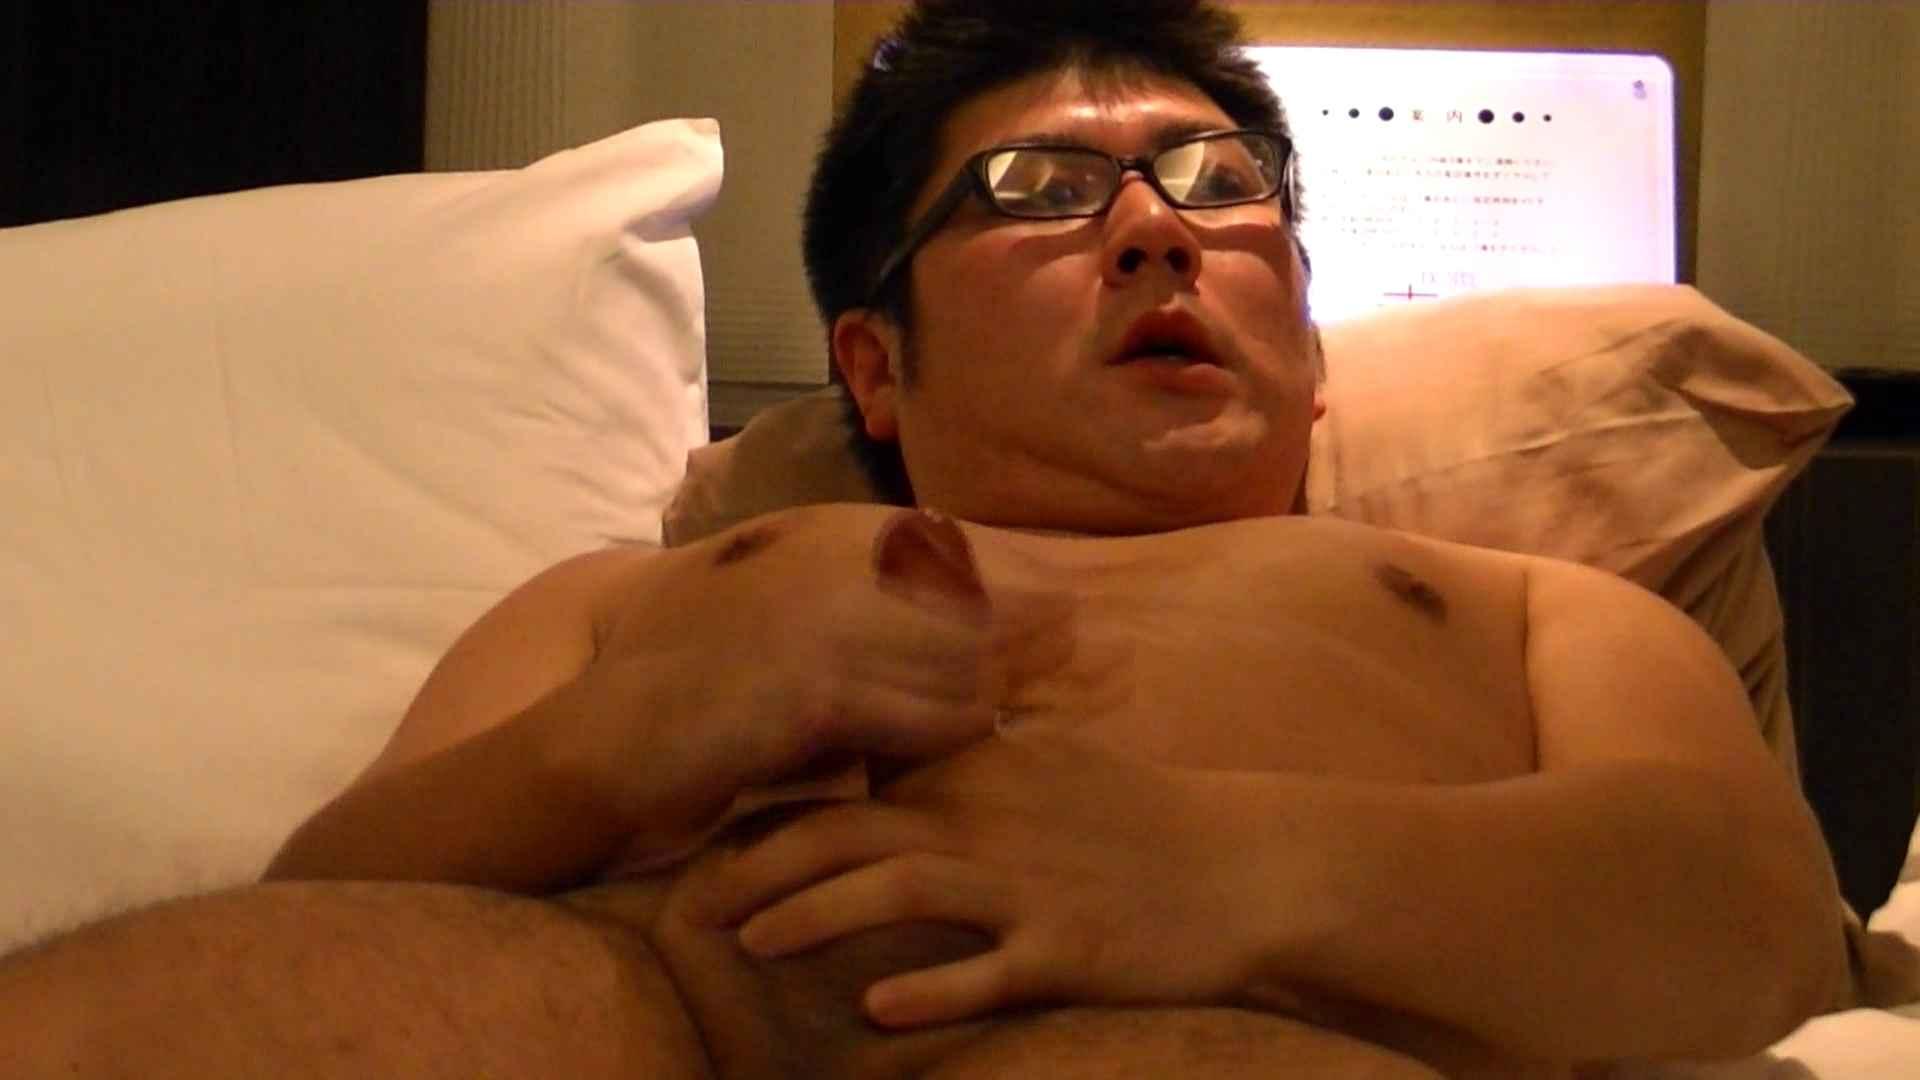 Mr.オナックスさん投稿!HD 貴方のオナニー三万円で撮影させてください。VOL.03 後編 投稿 ゲイ無修正ビデオ画像 106枚 99